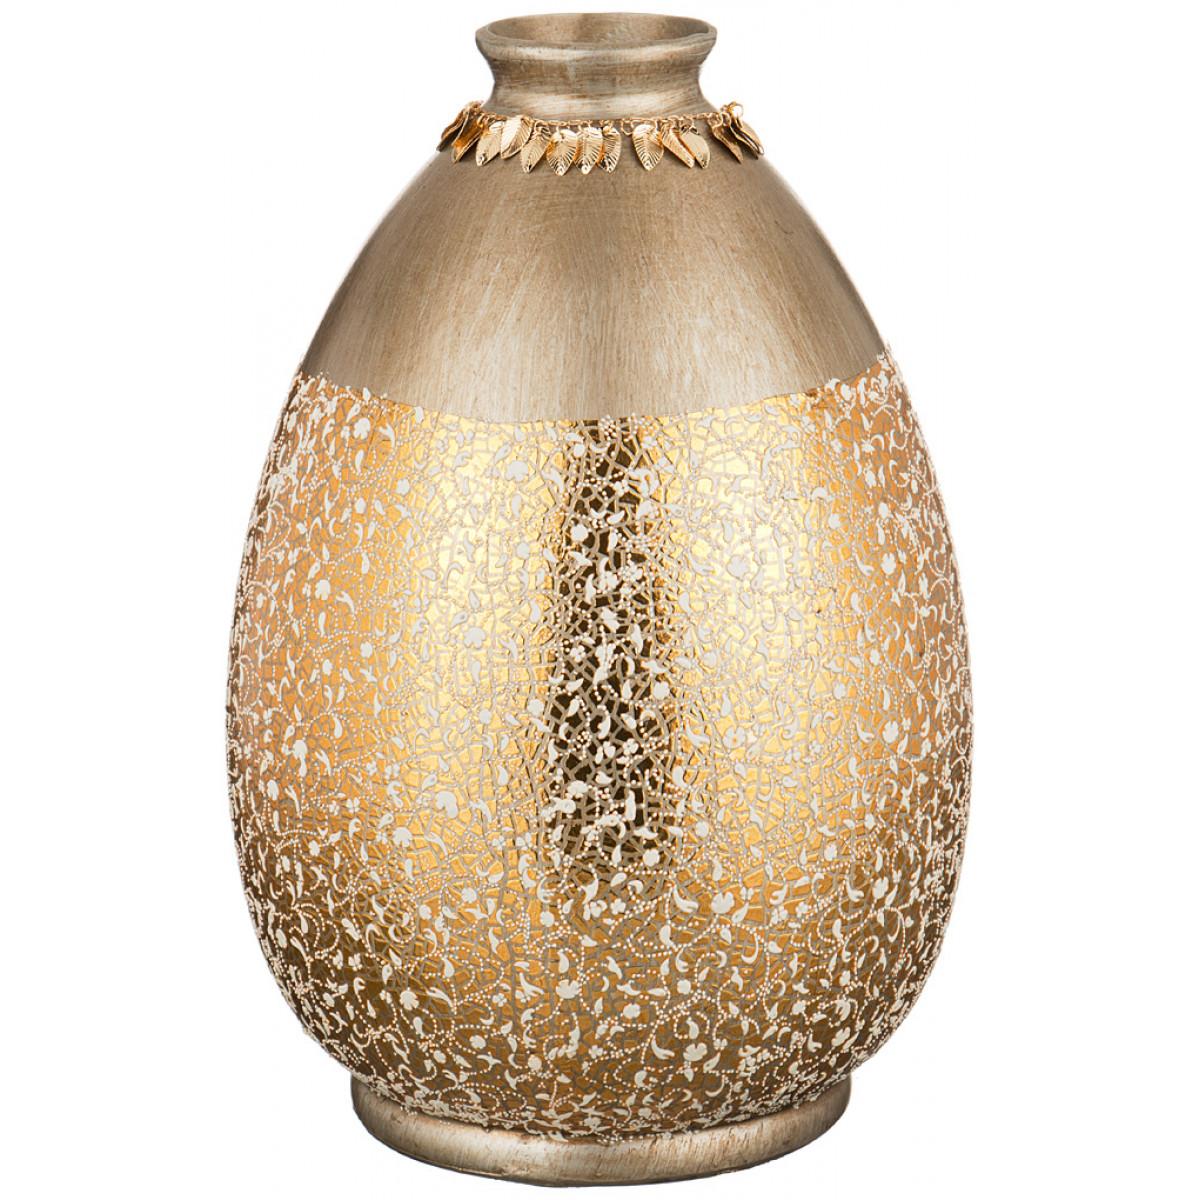 Вазы Lefard Ваза Karenza (26х36 см) lefard ваза adria 27х30 см